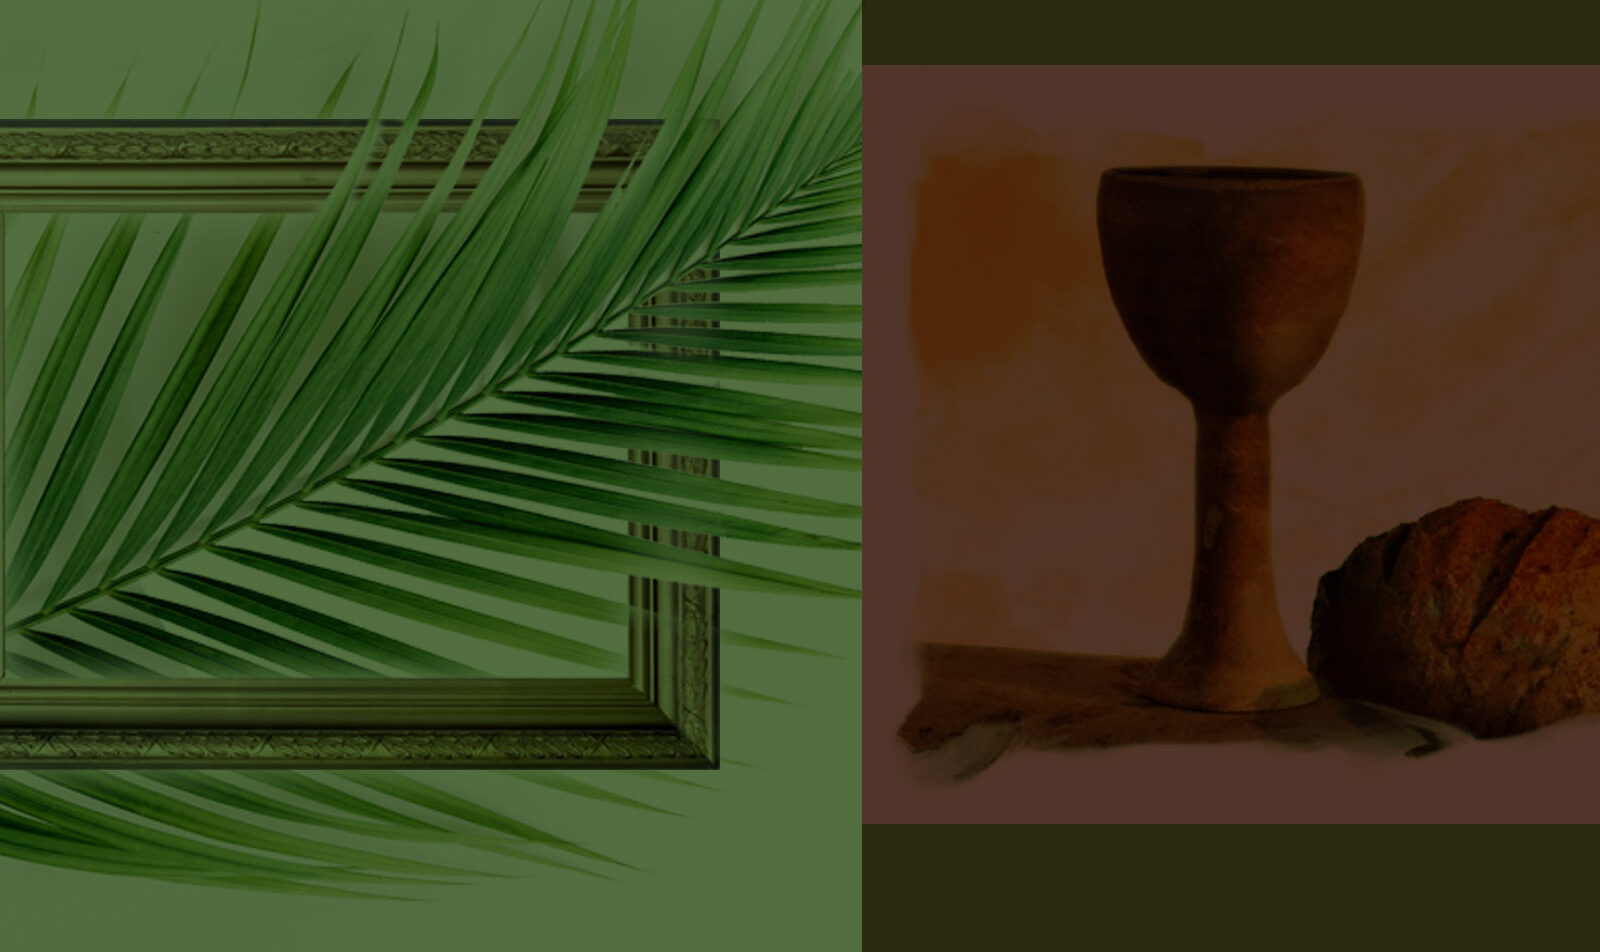 Palms Sunday & Last Supper